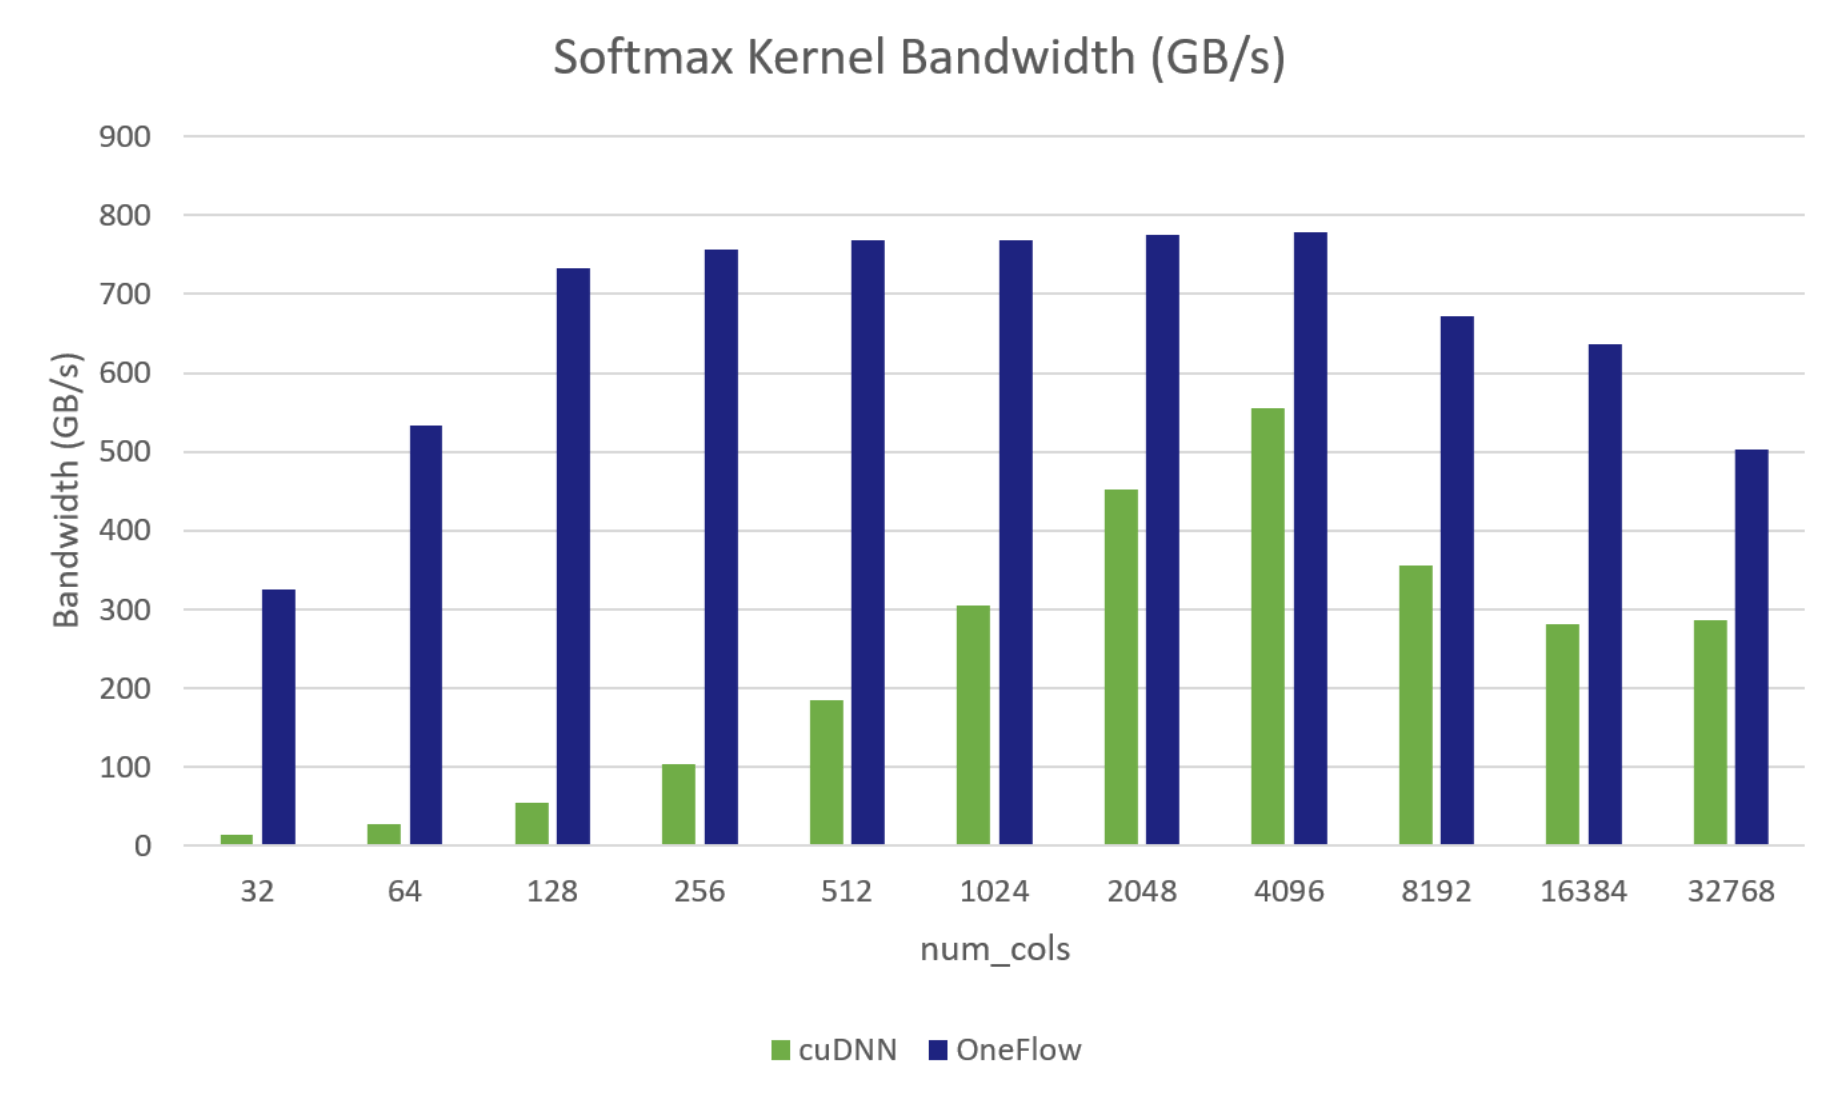 softmax bandwidth